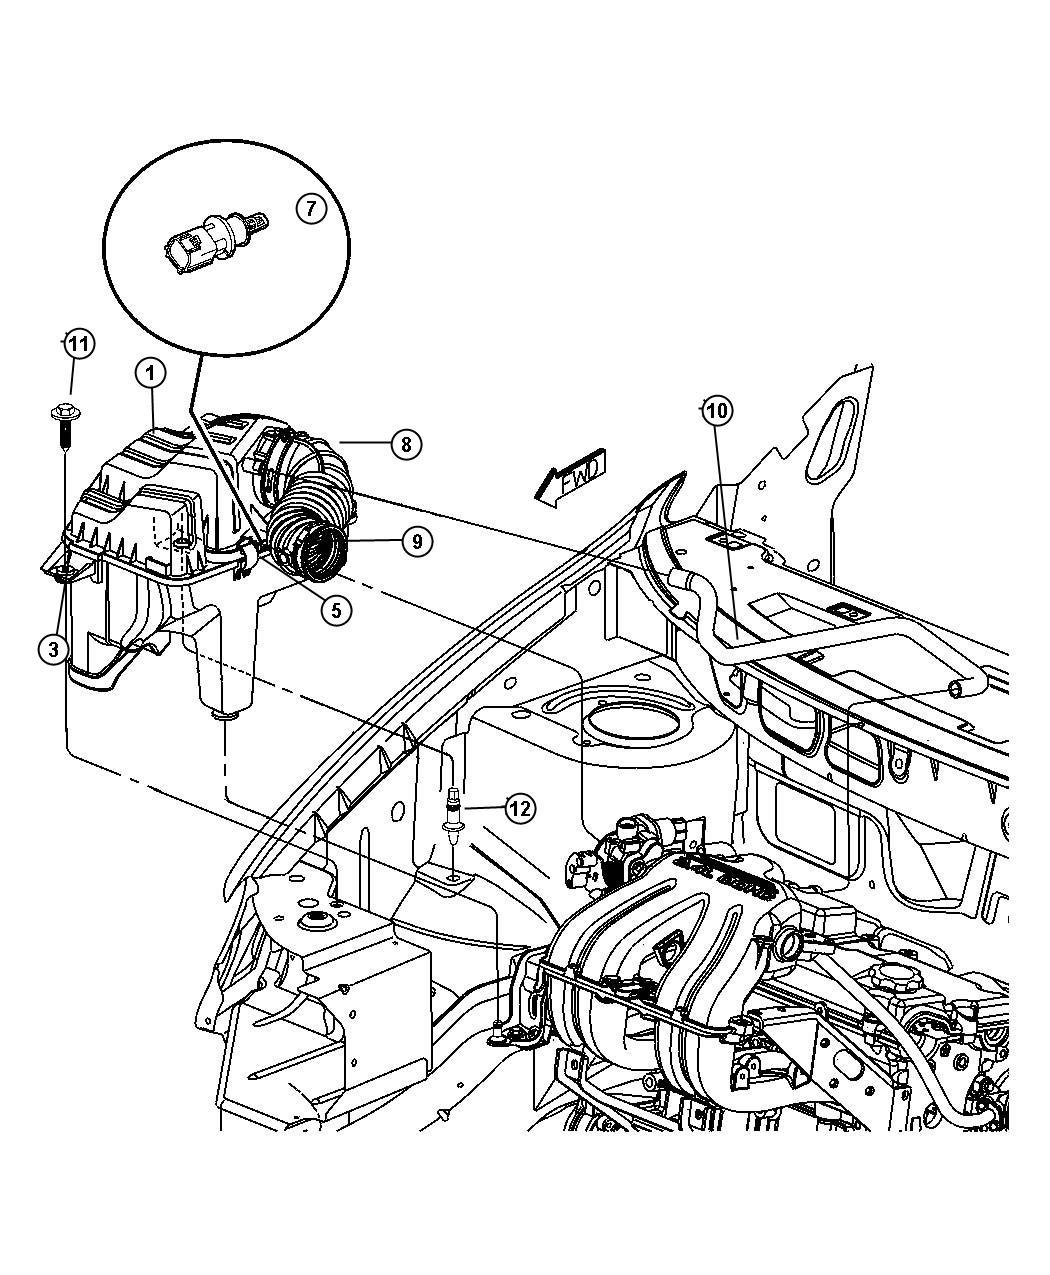 Dodge Caravan Element, filter. Air, air cleaner. Engine